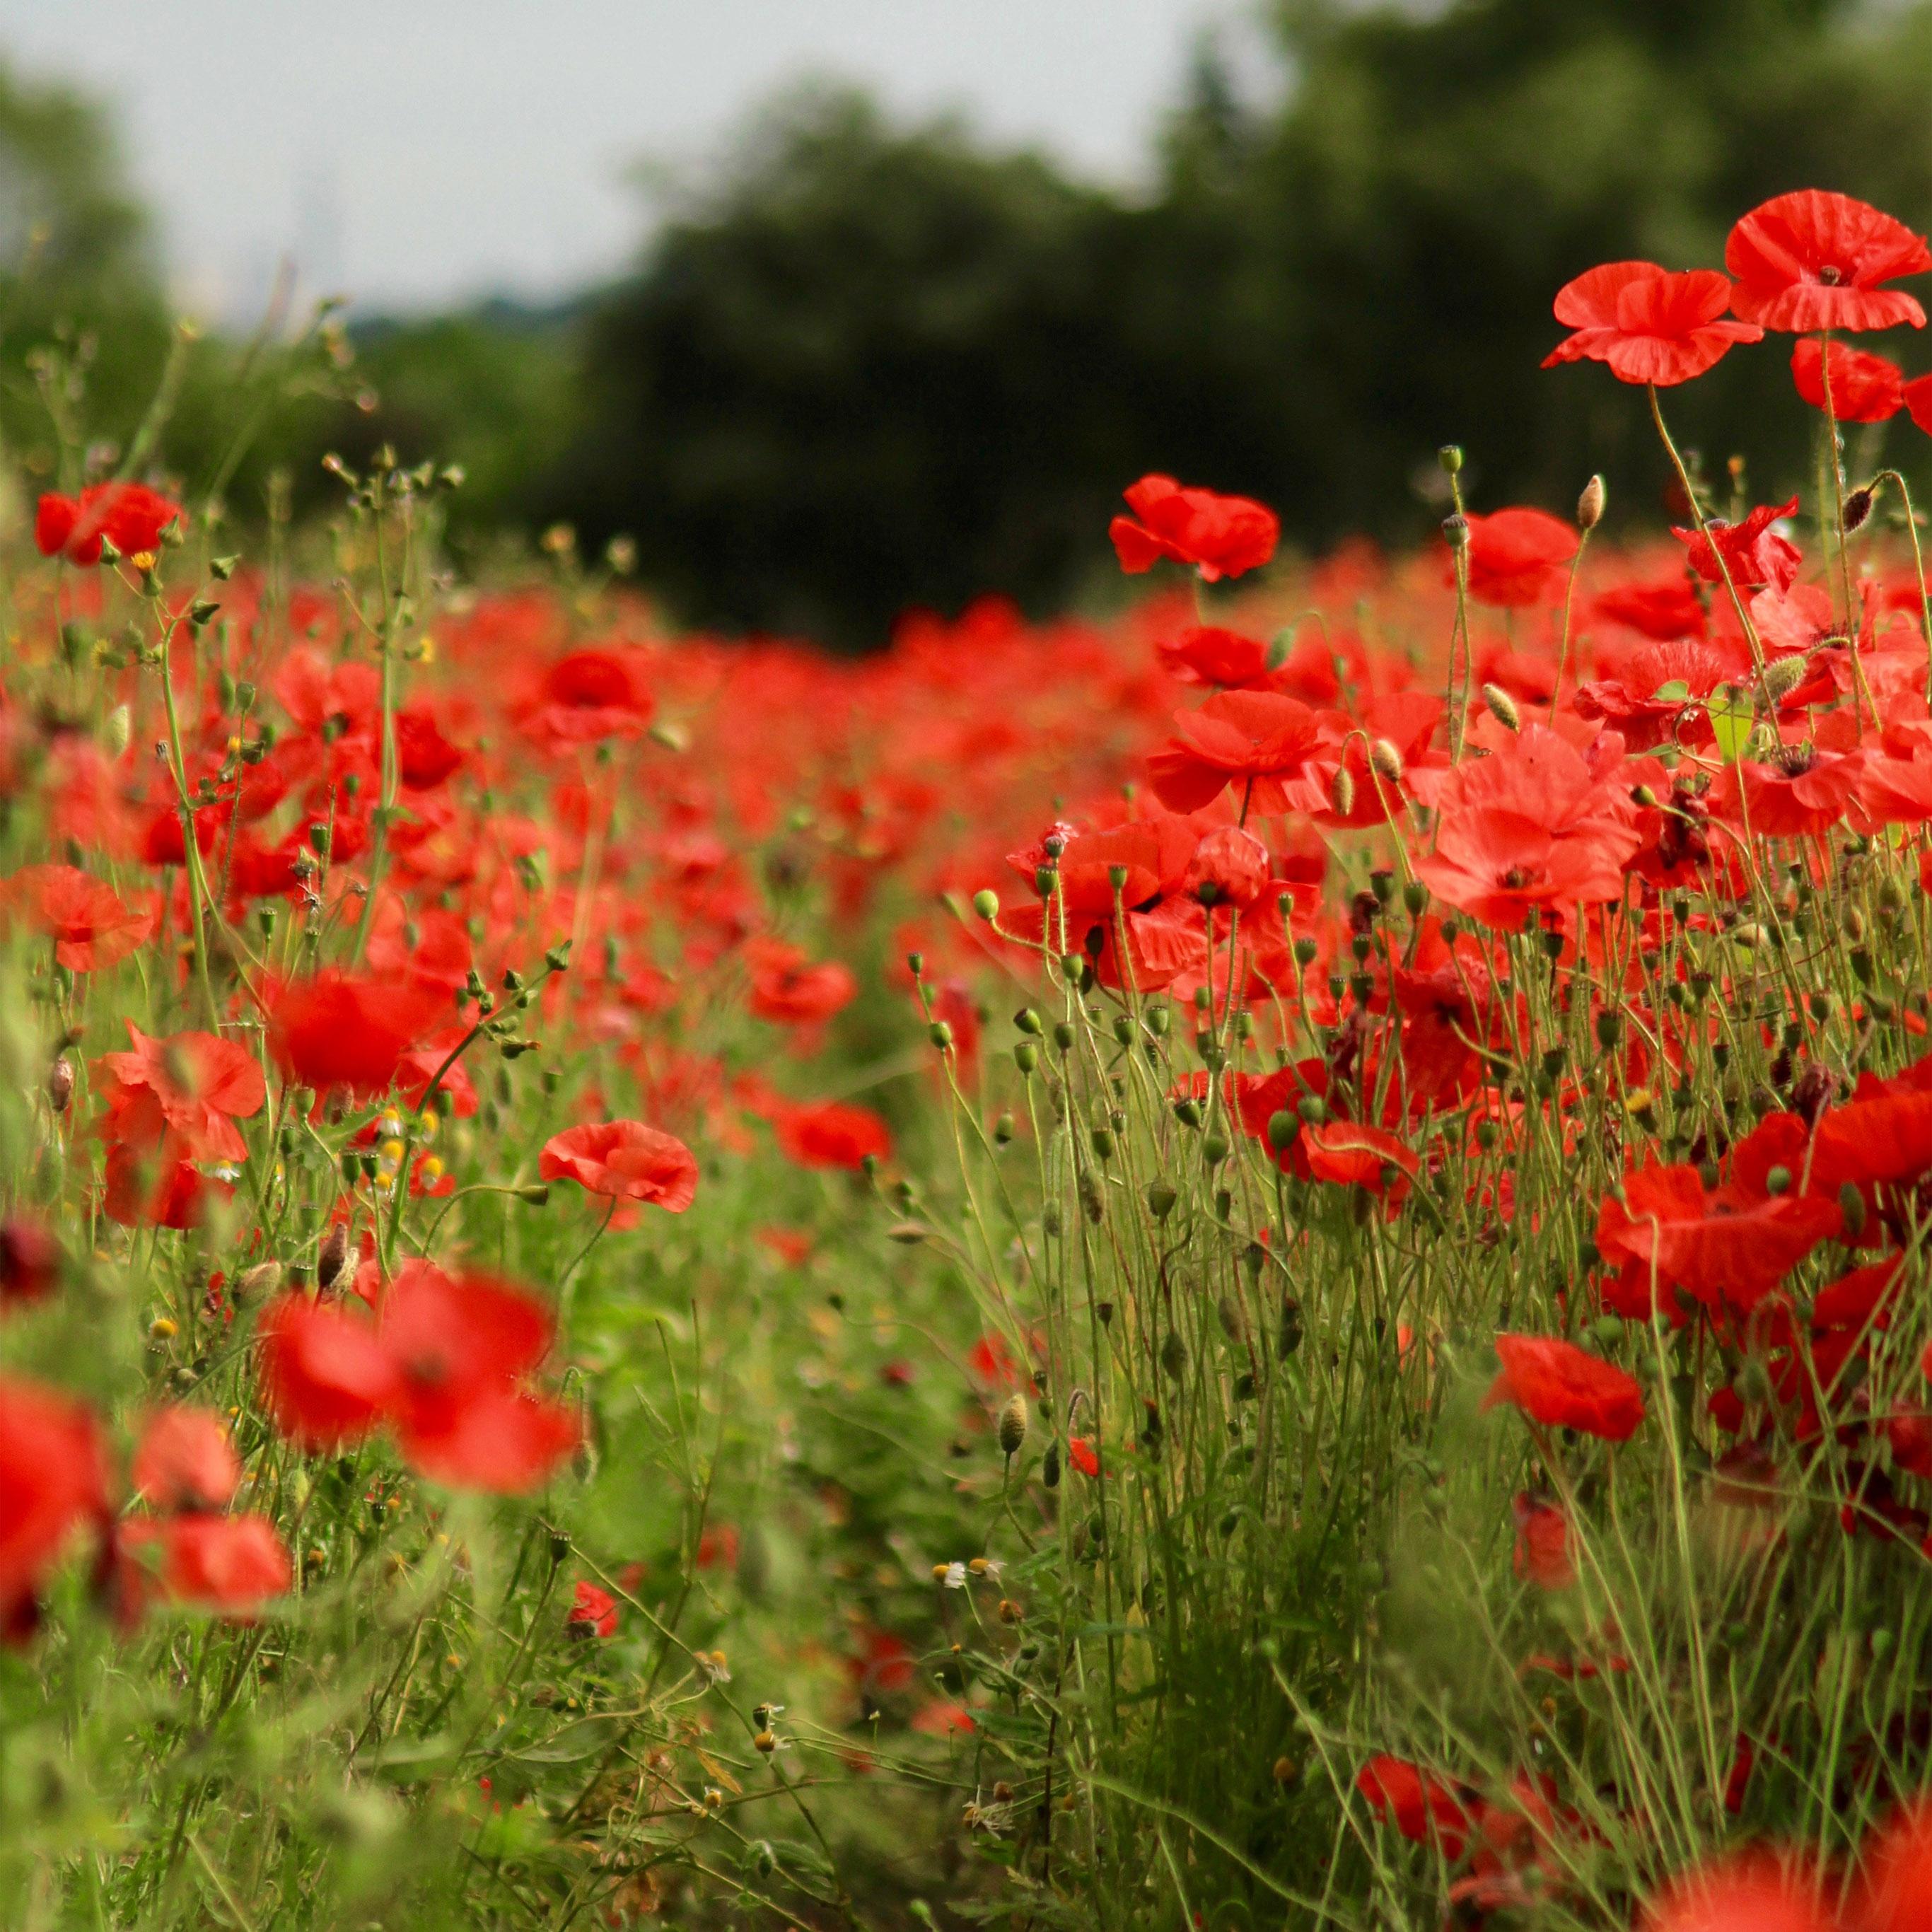 Nv39 Flower Red Spring Nature Wallpaper